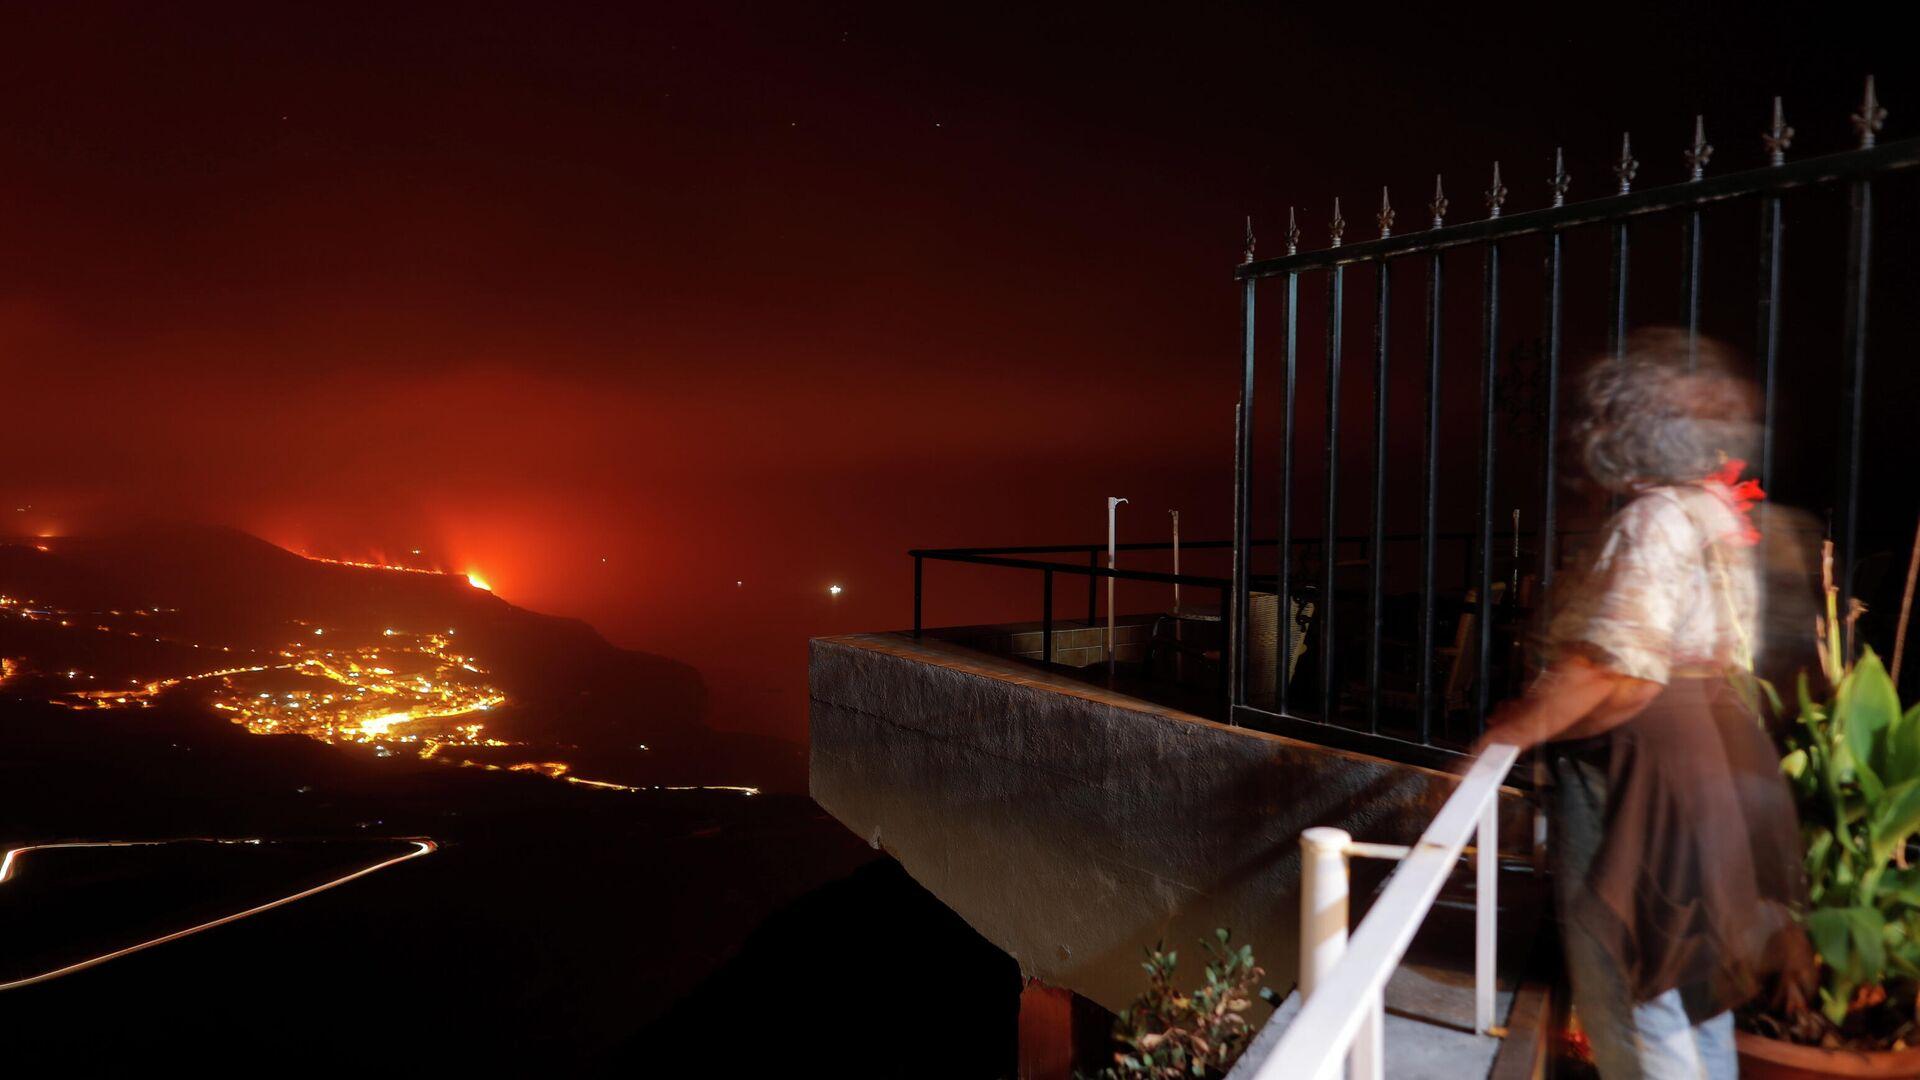 Vulkanausbruch auf La Palma  - SNA, 1920, 29.09.2021